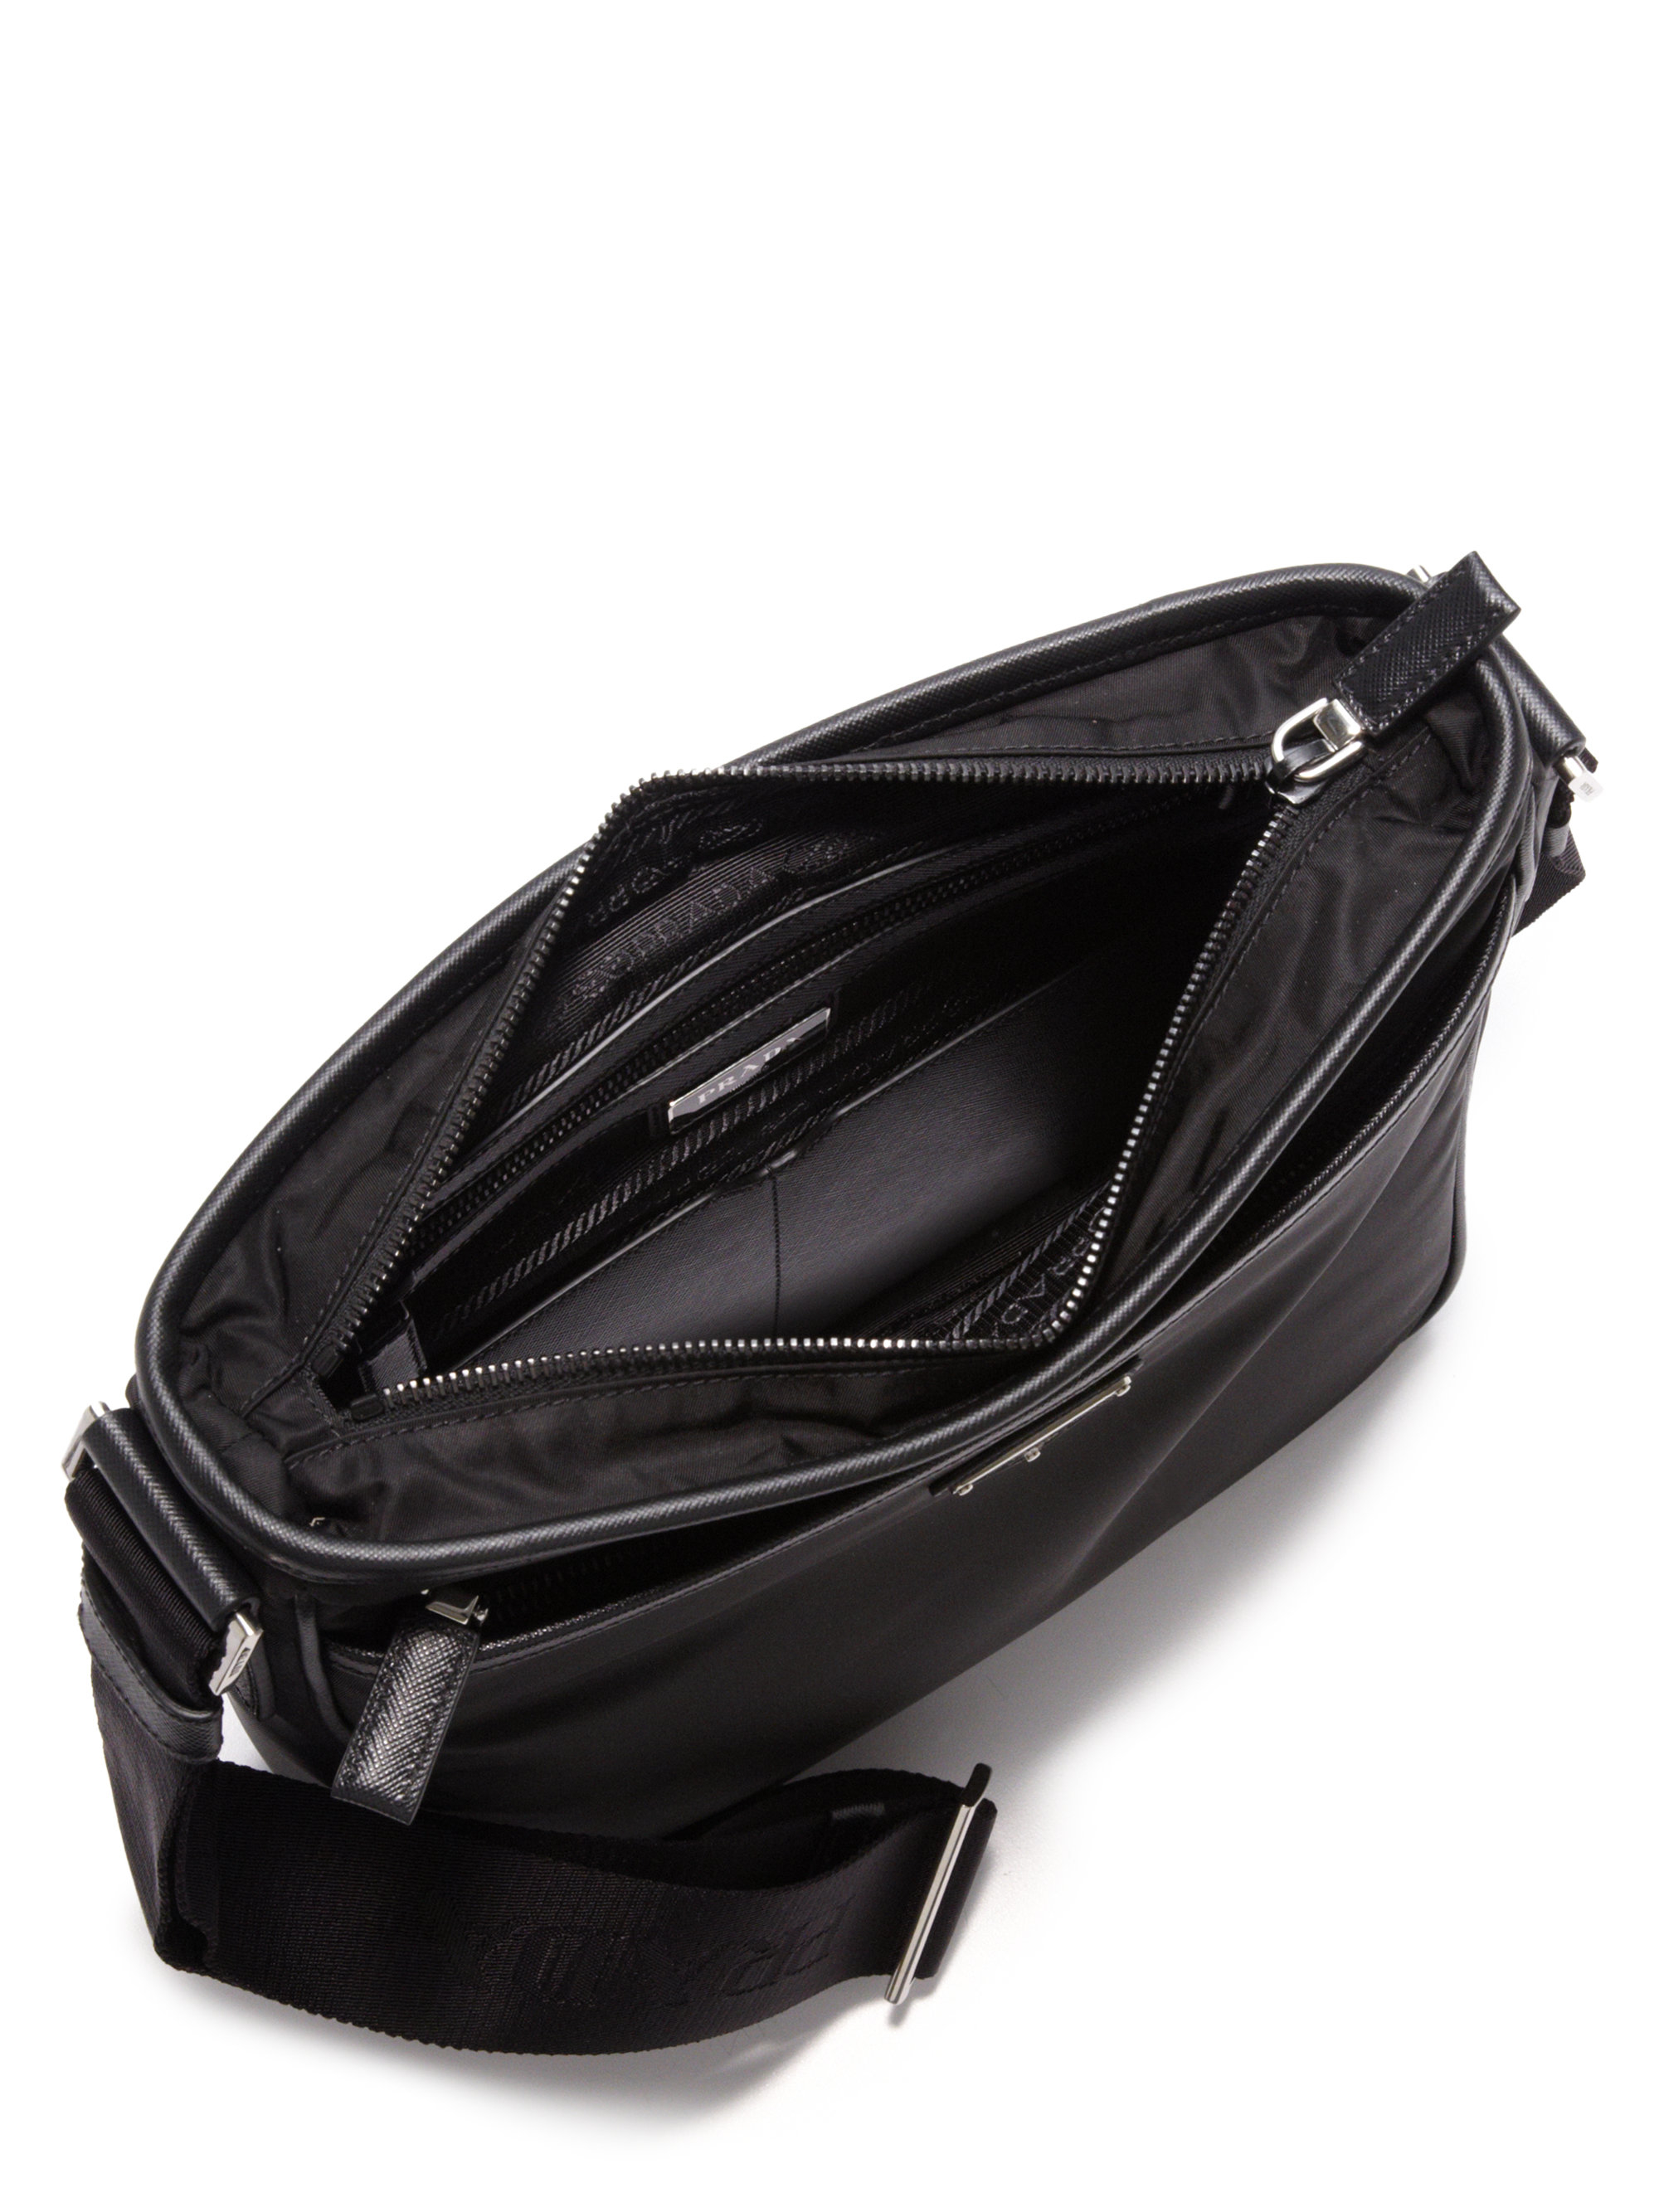 prada purse replica - Prada Nylon Crossbody Bag in Black for Men | Lyst